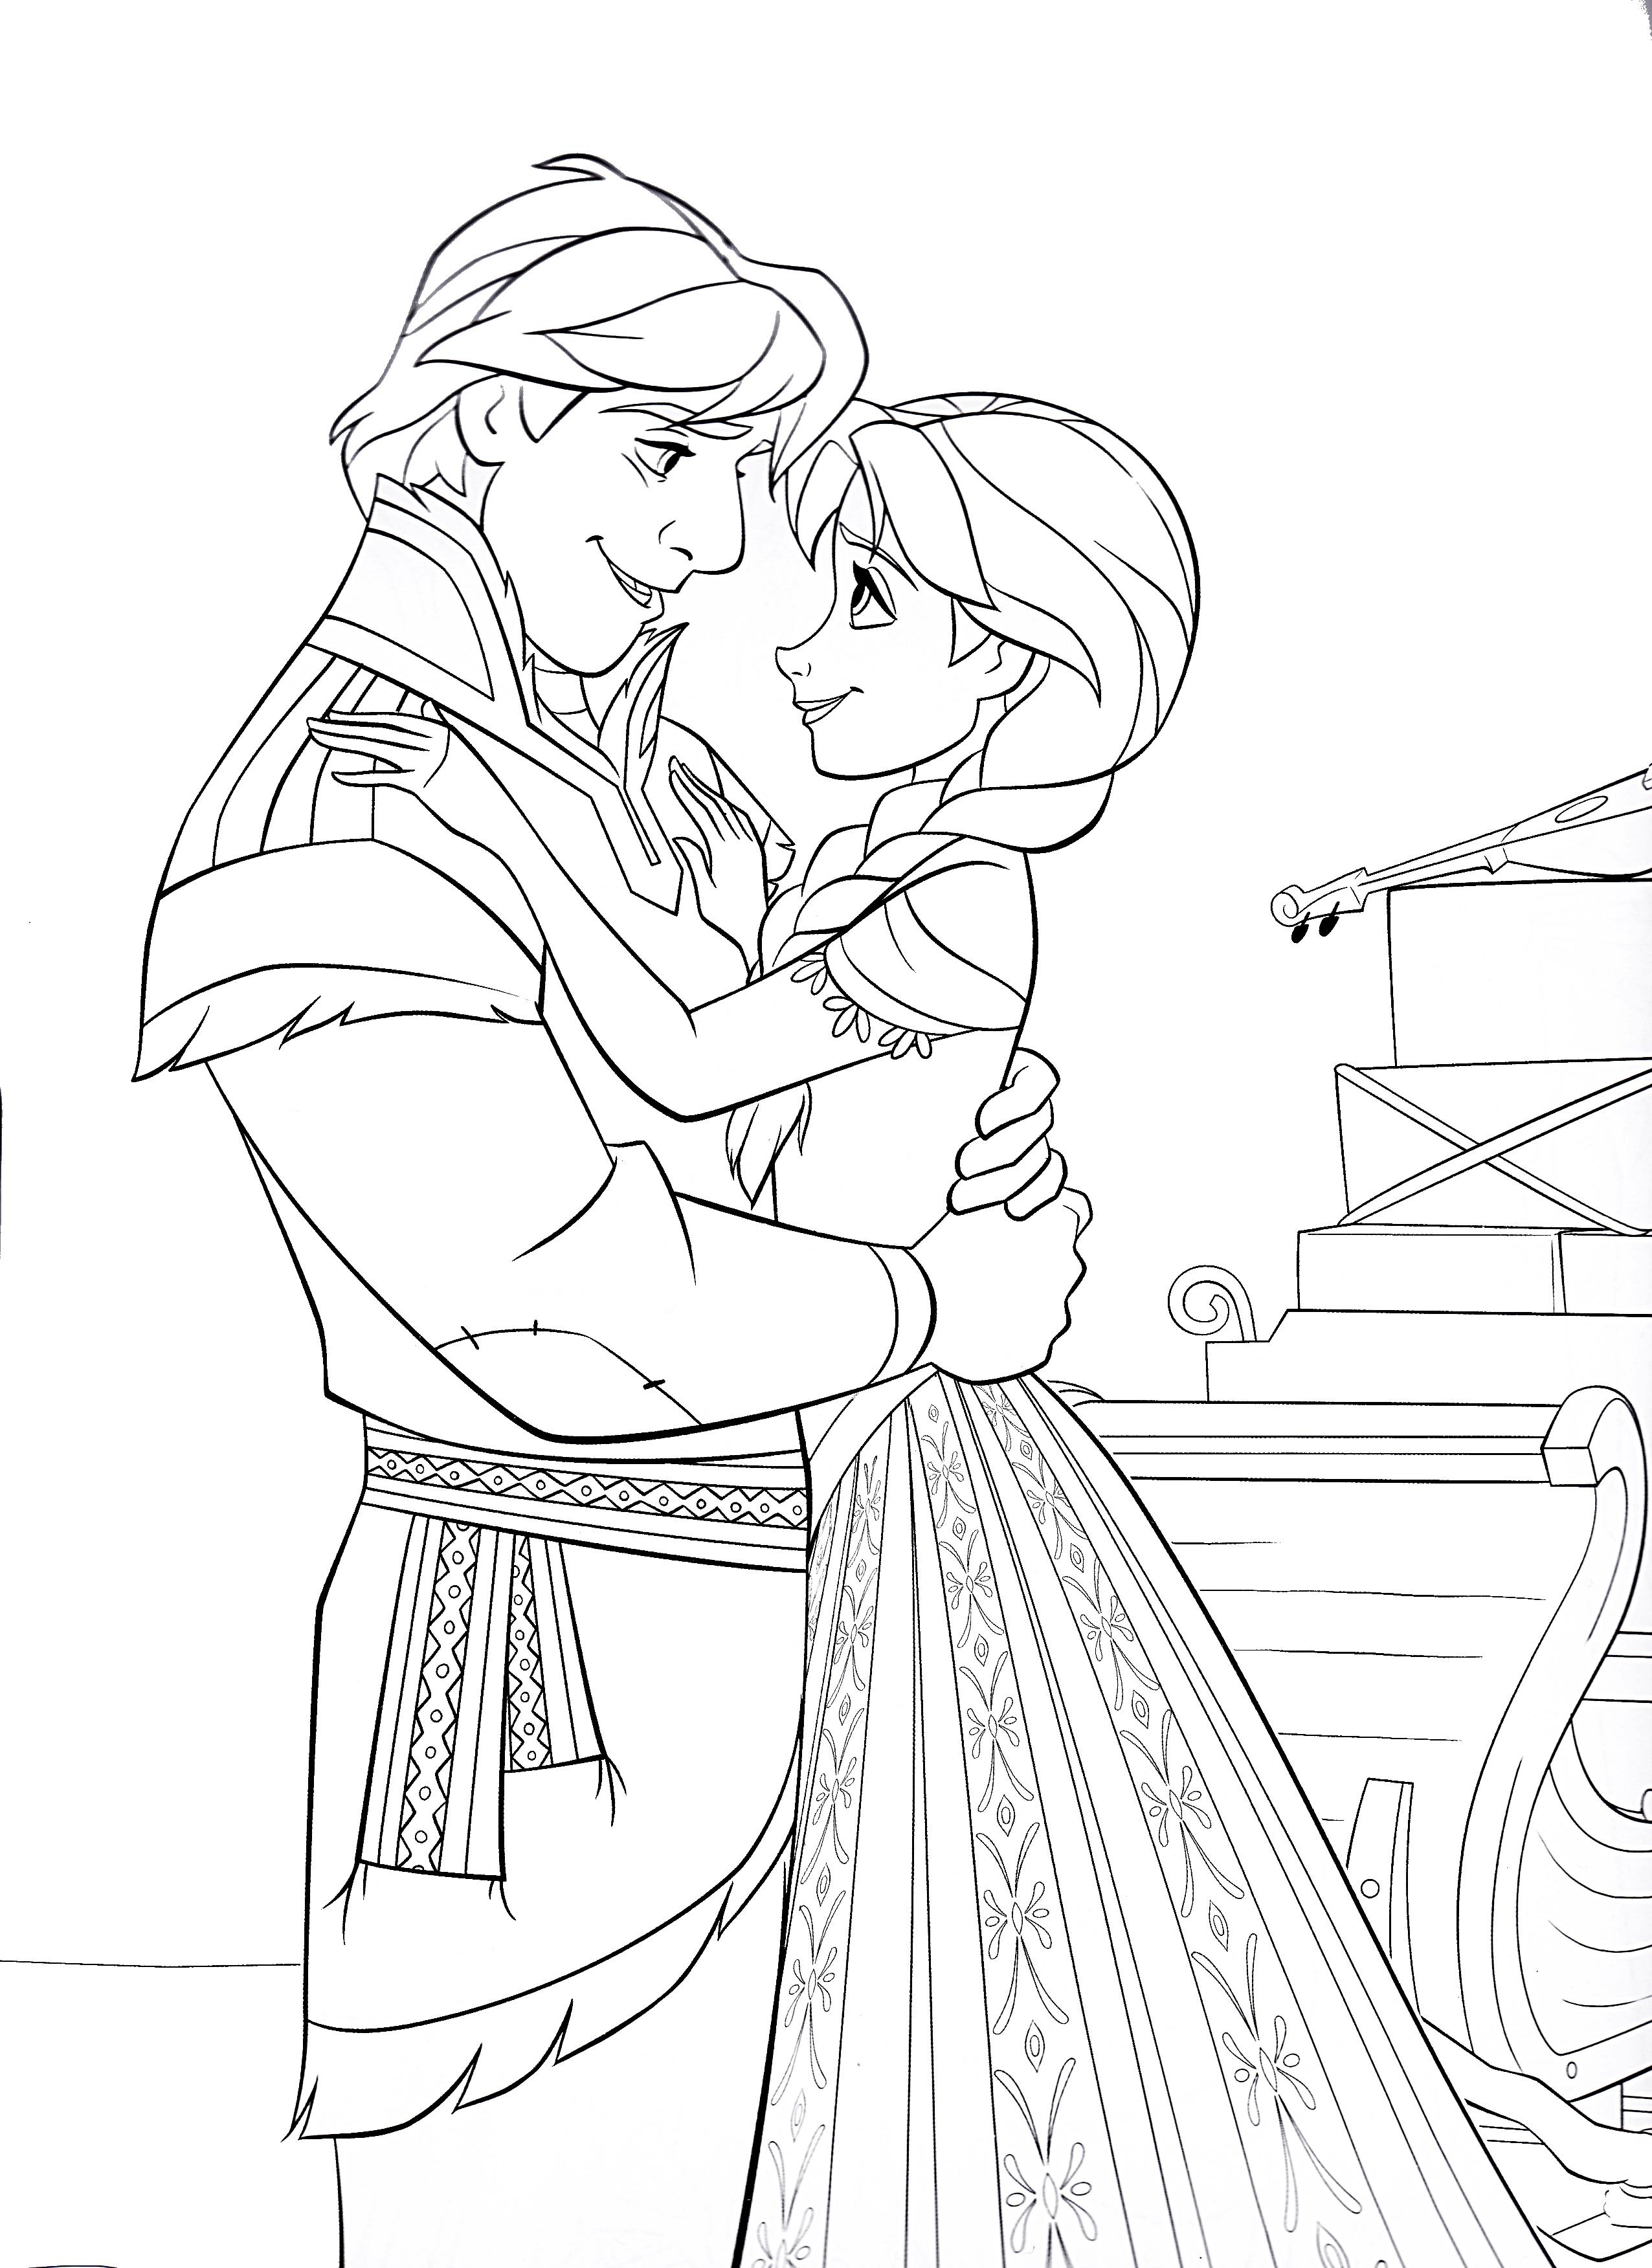 Prince hans frozen coloring pages - Prince Hans Frozen Coloring Pages 40